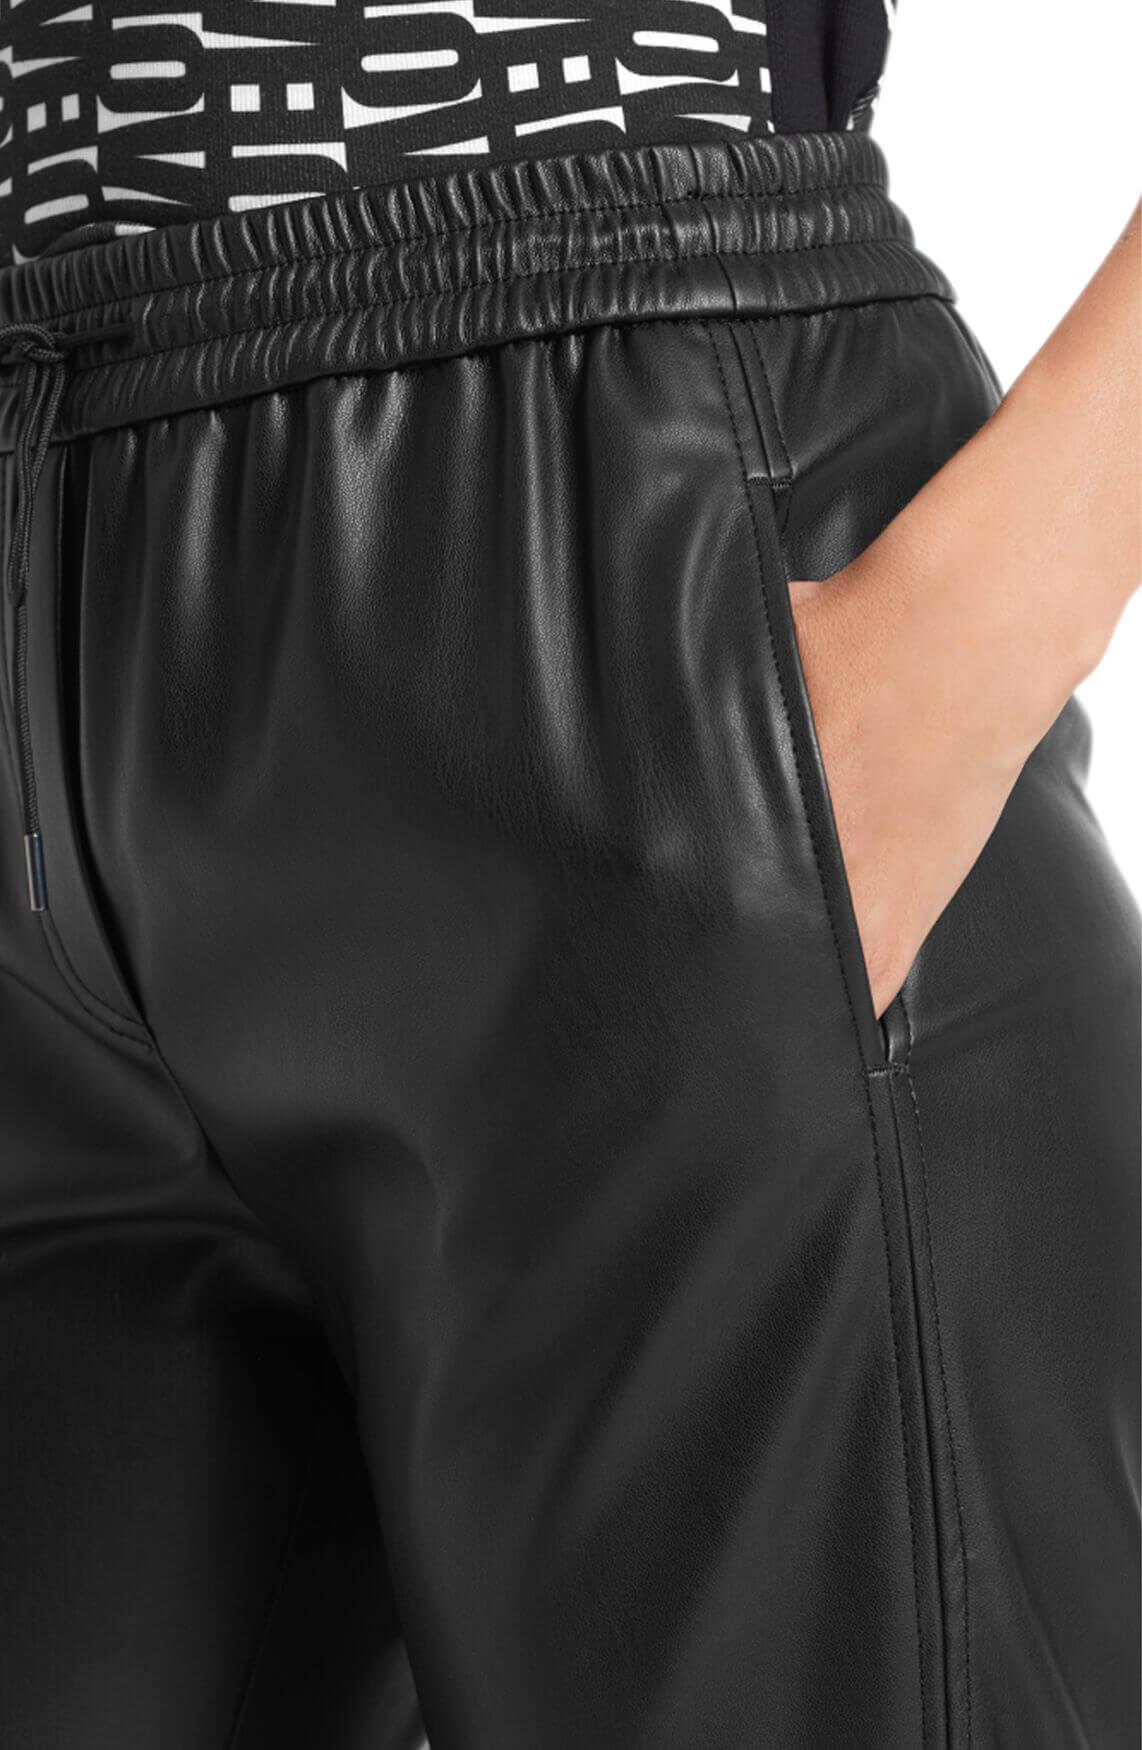 Marccain Sports Dames Pantalon van imitatienappa Zwart